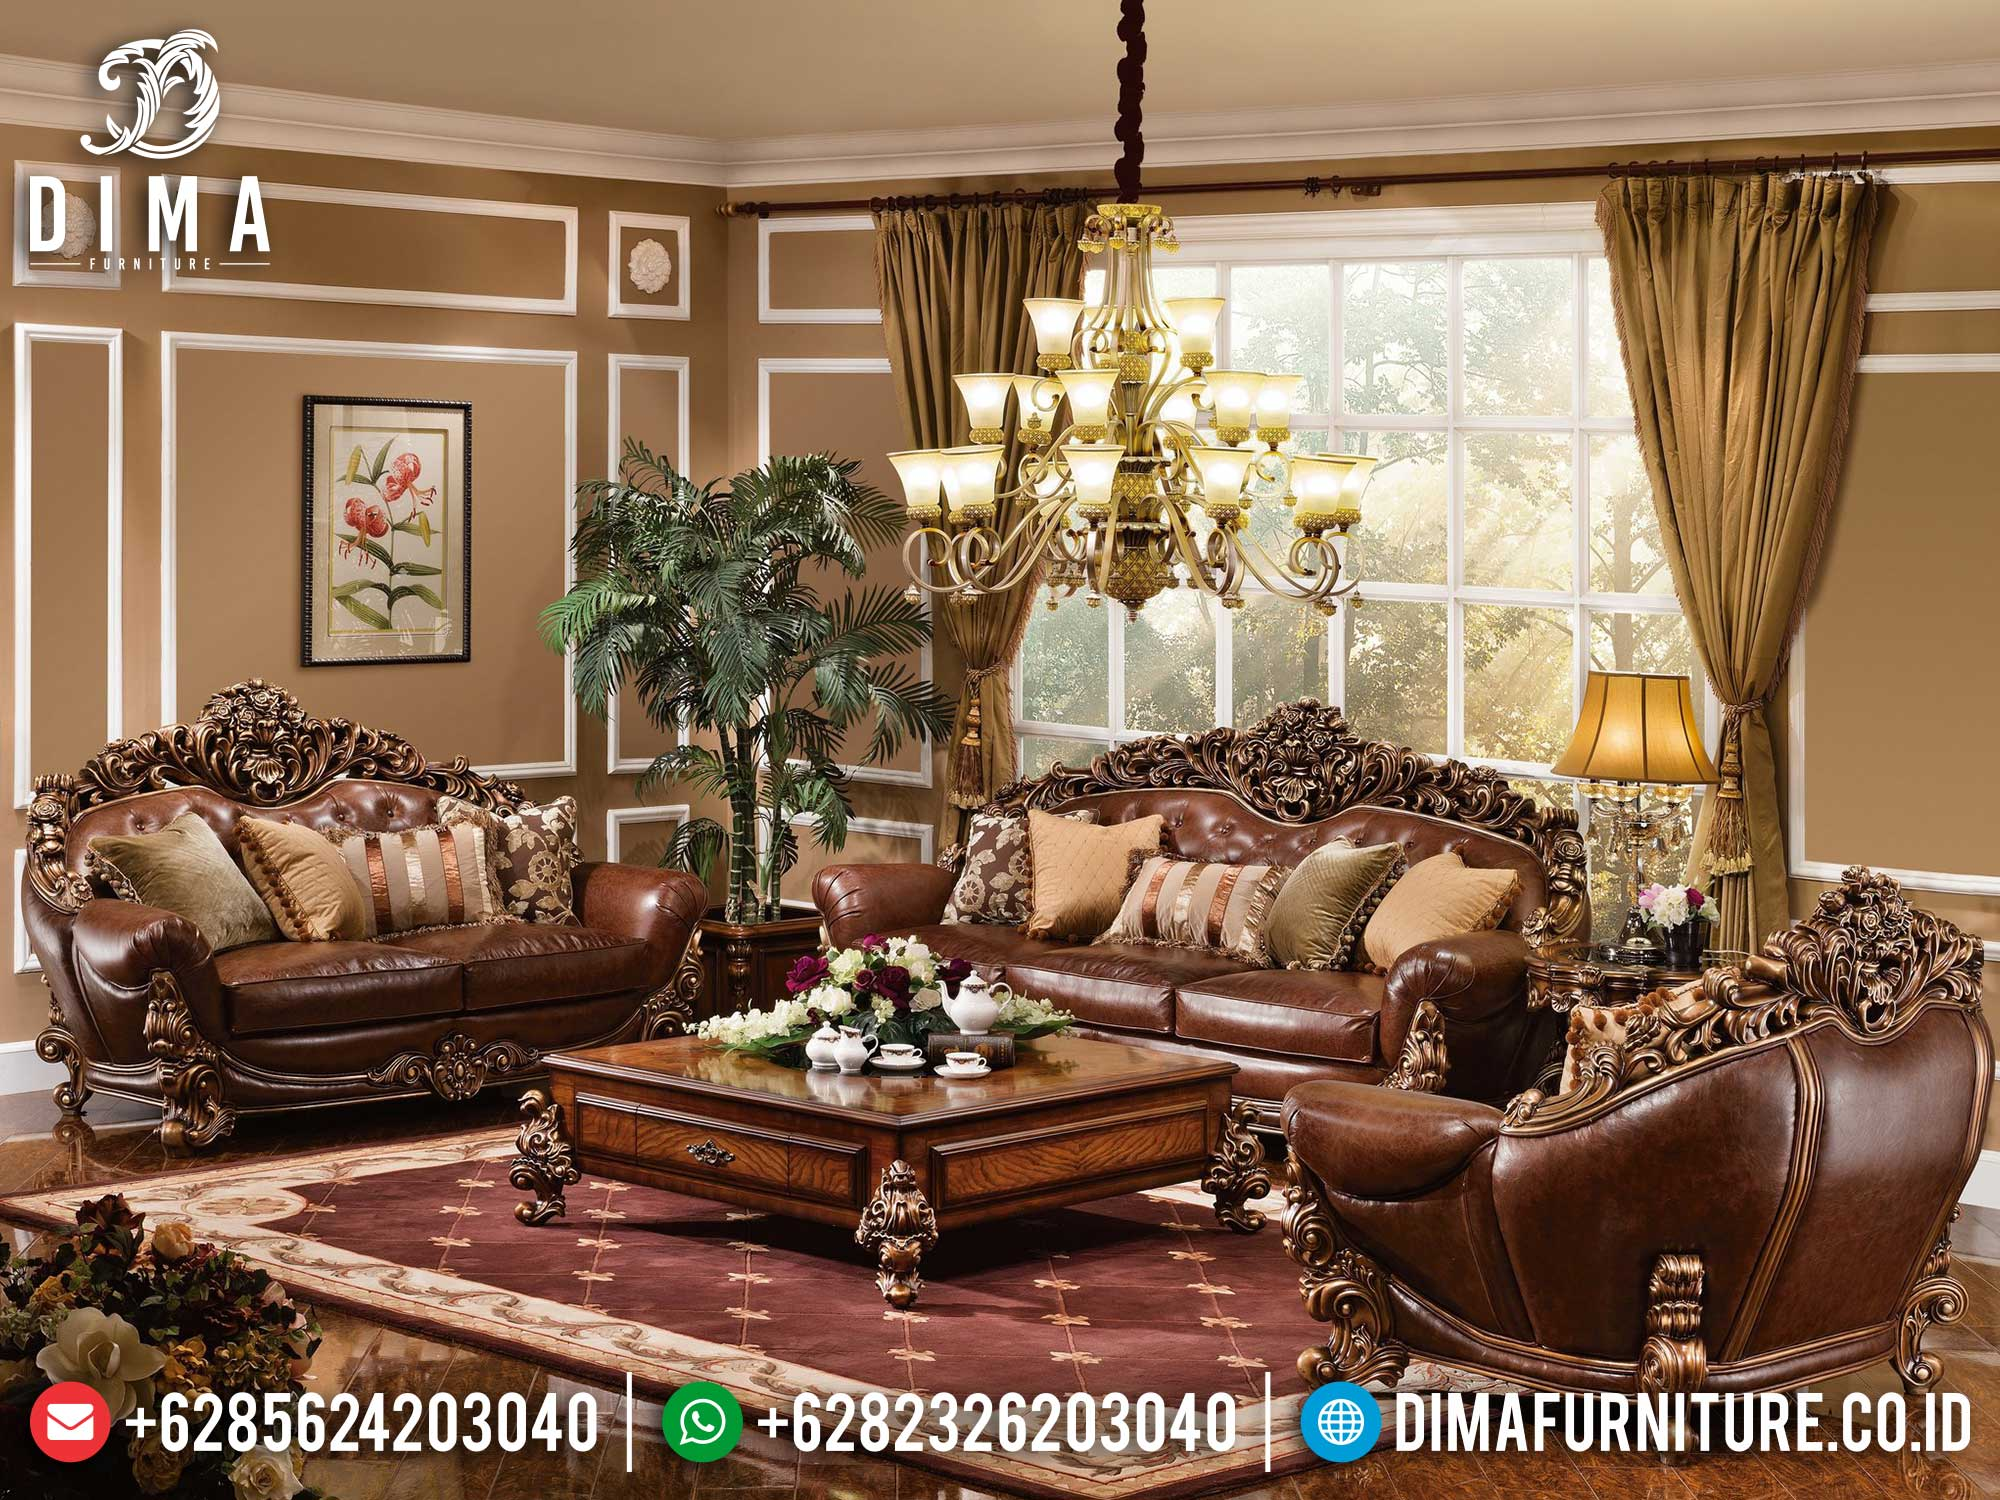 Sofa Tamu Mewah Jati Natural Classic Luxury Brunello Design Mebel Jepara ST-1278